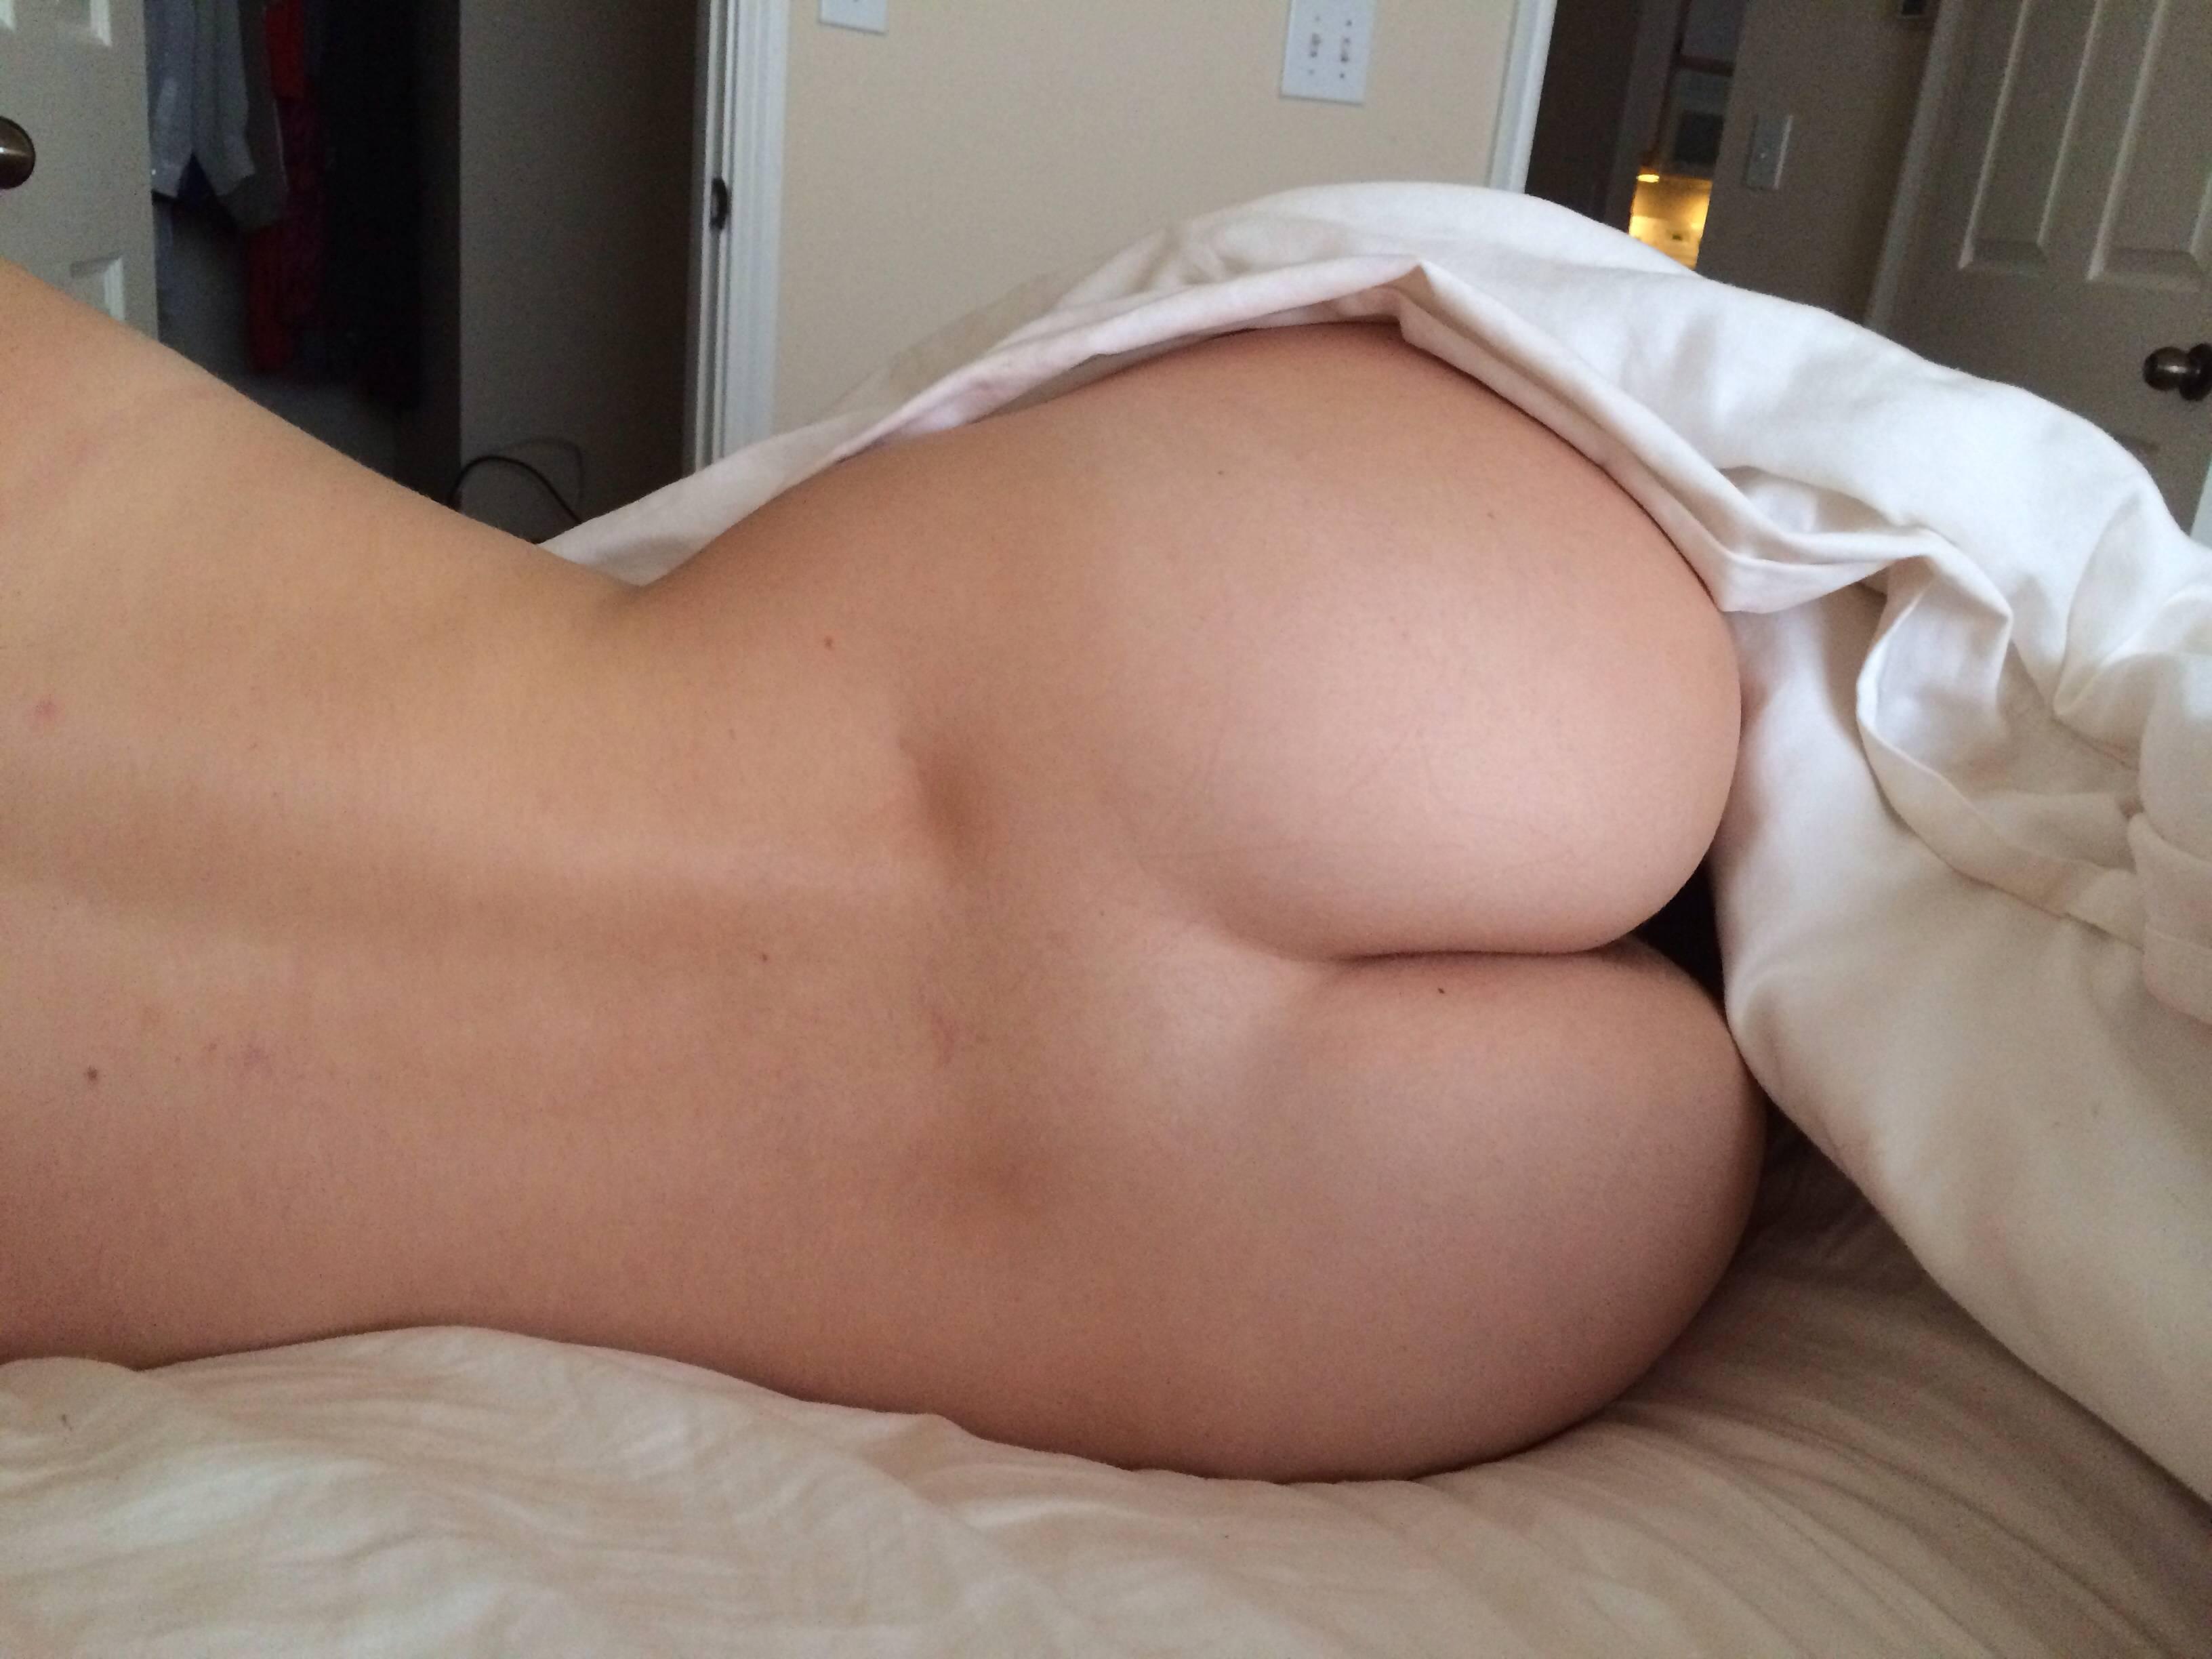 Surprise Lesbian Wake Up